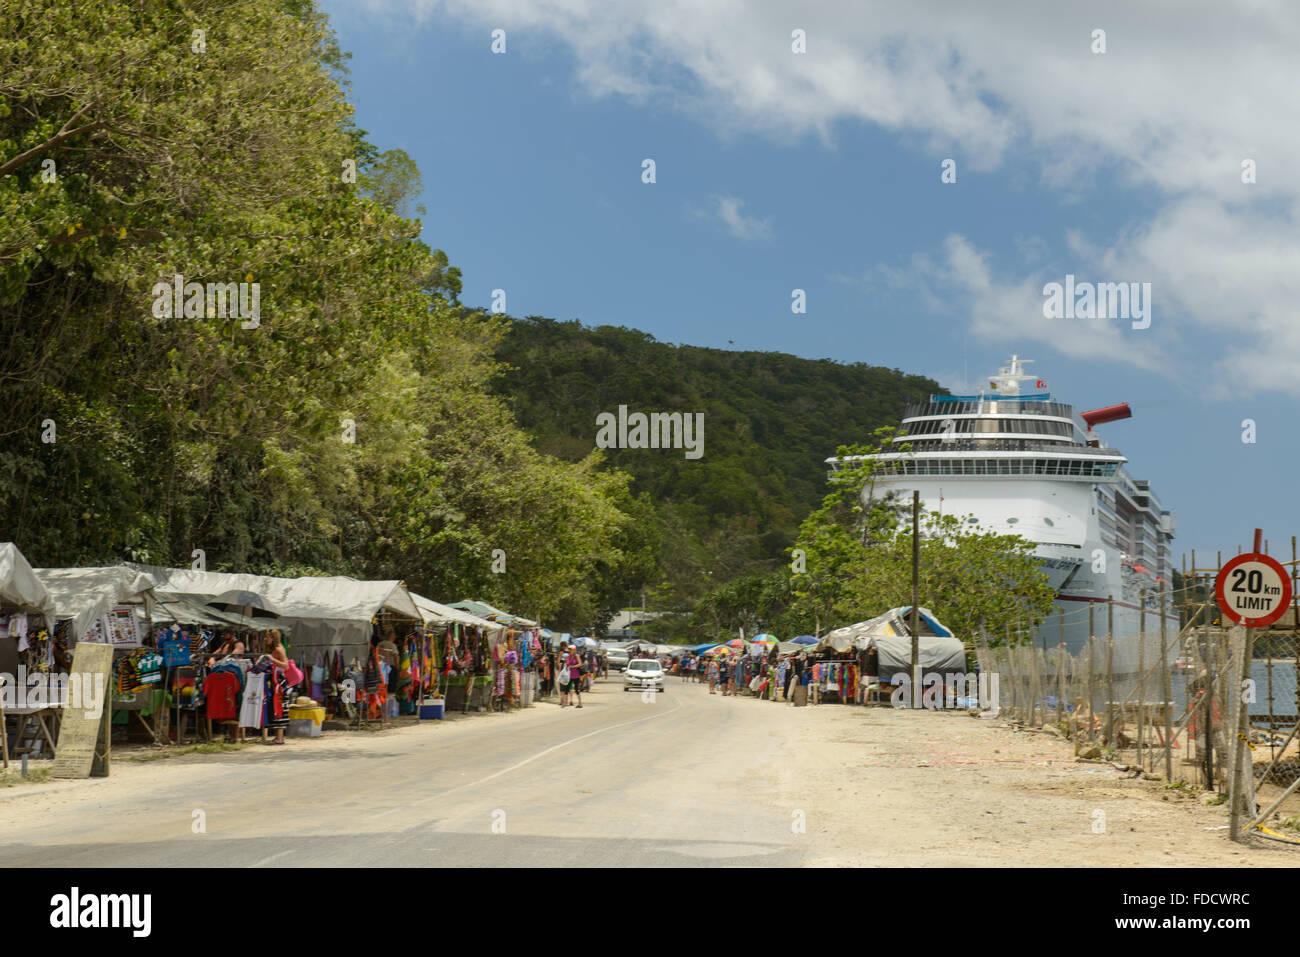 The cruise ship 'Carnival Spirit' docked at Port Vila, Vanuatu, dominates the quayside market. Stock Photo